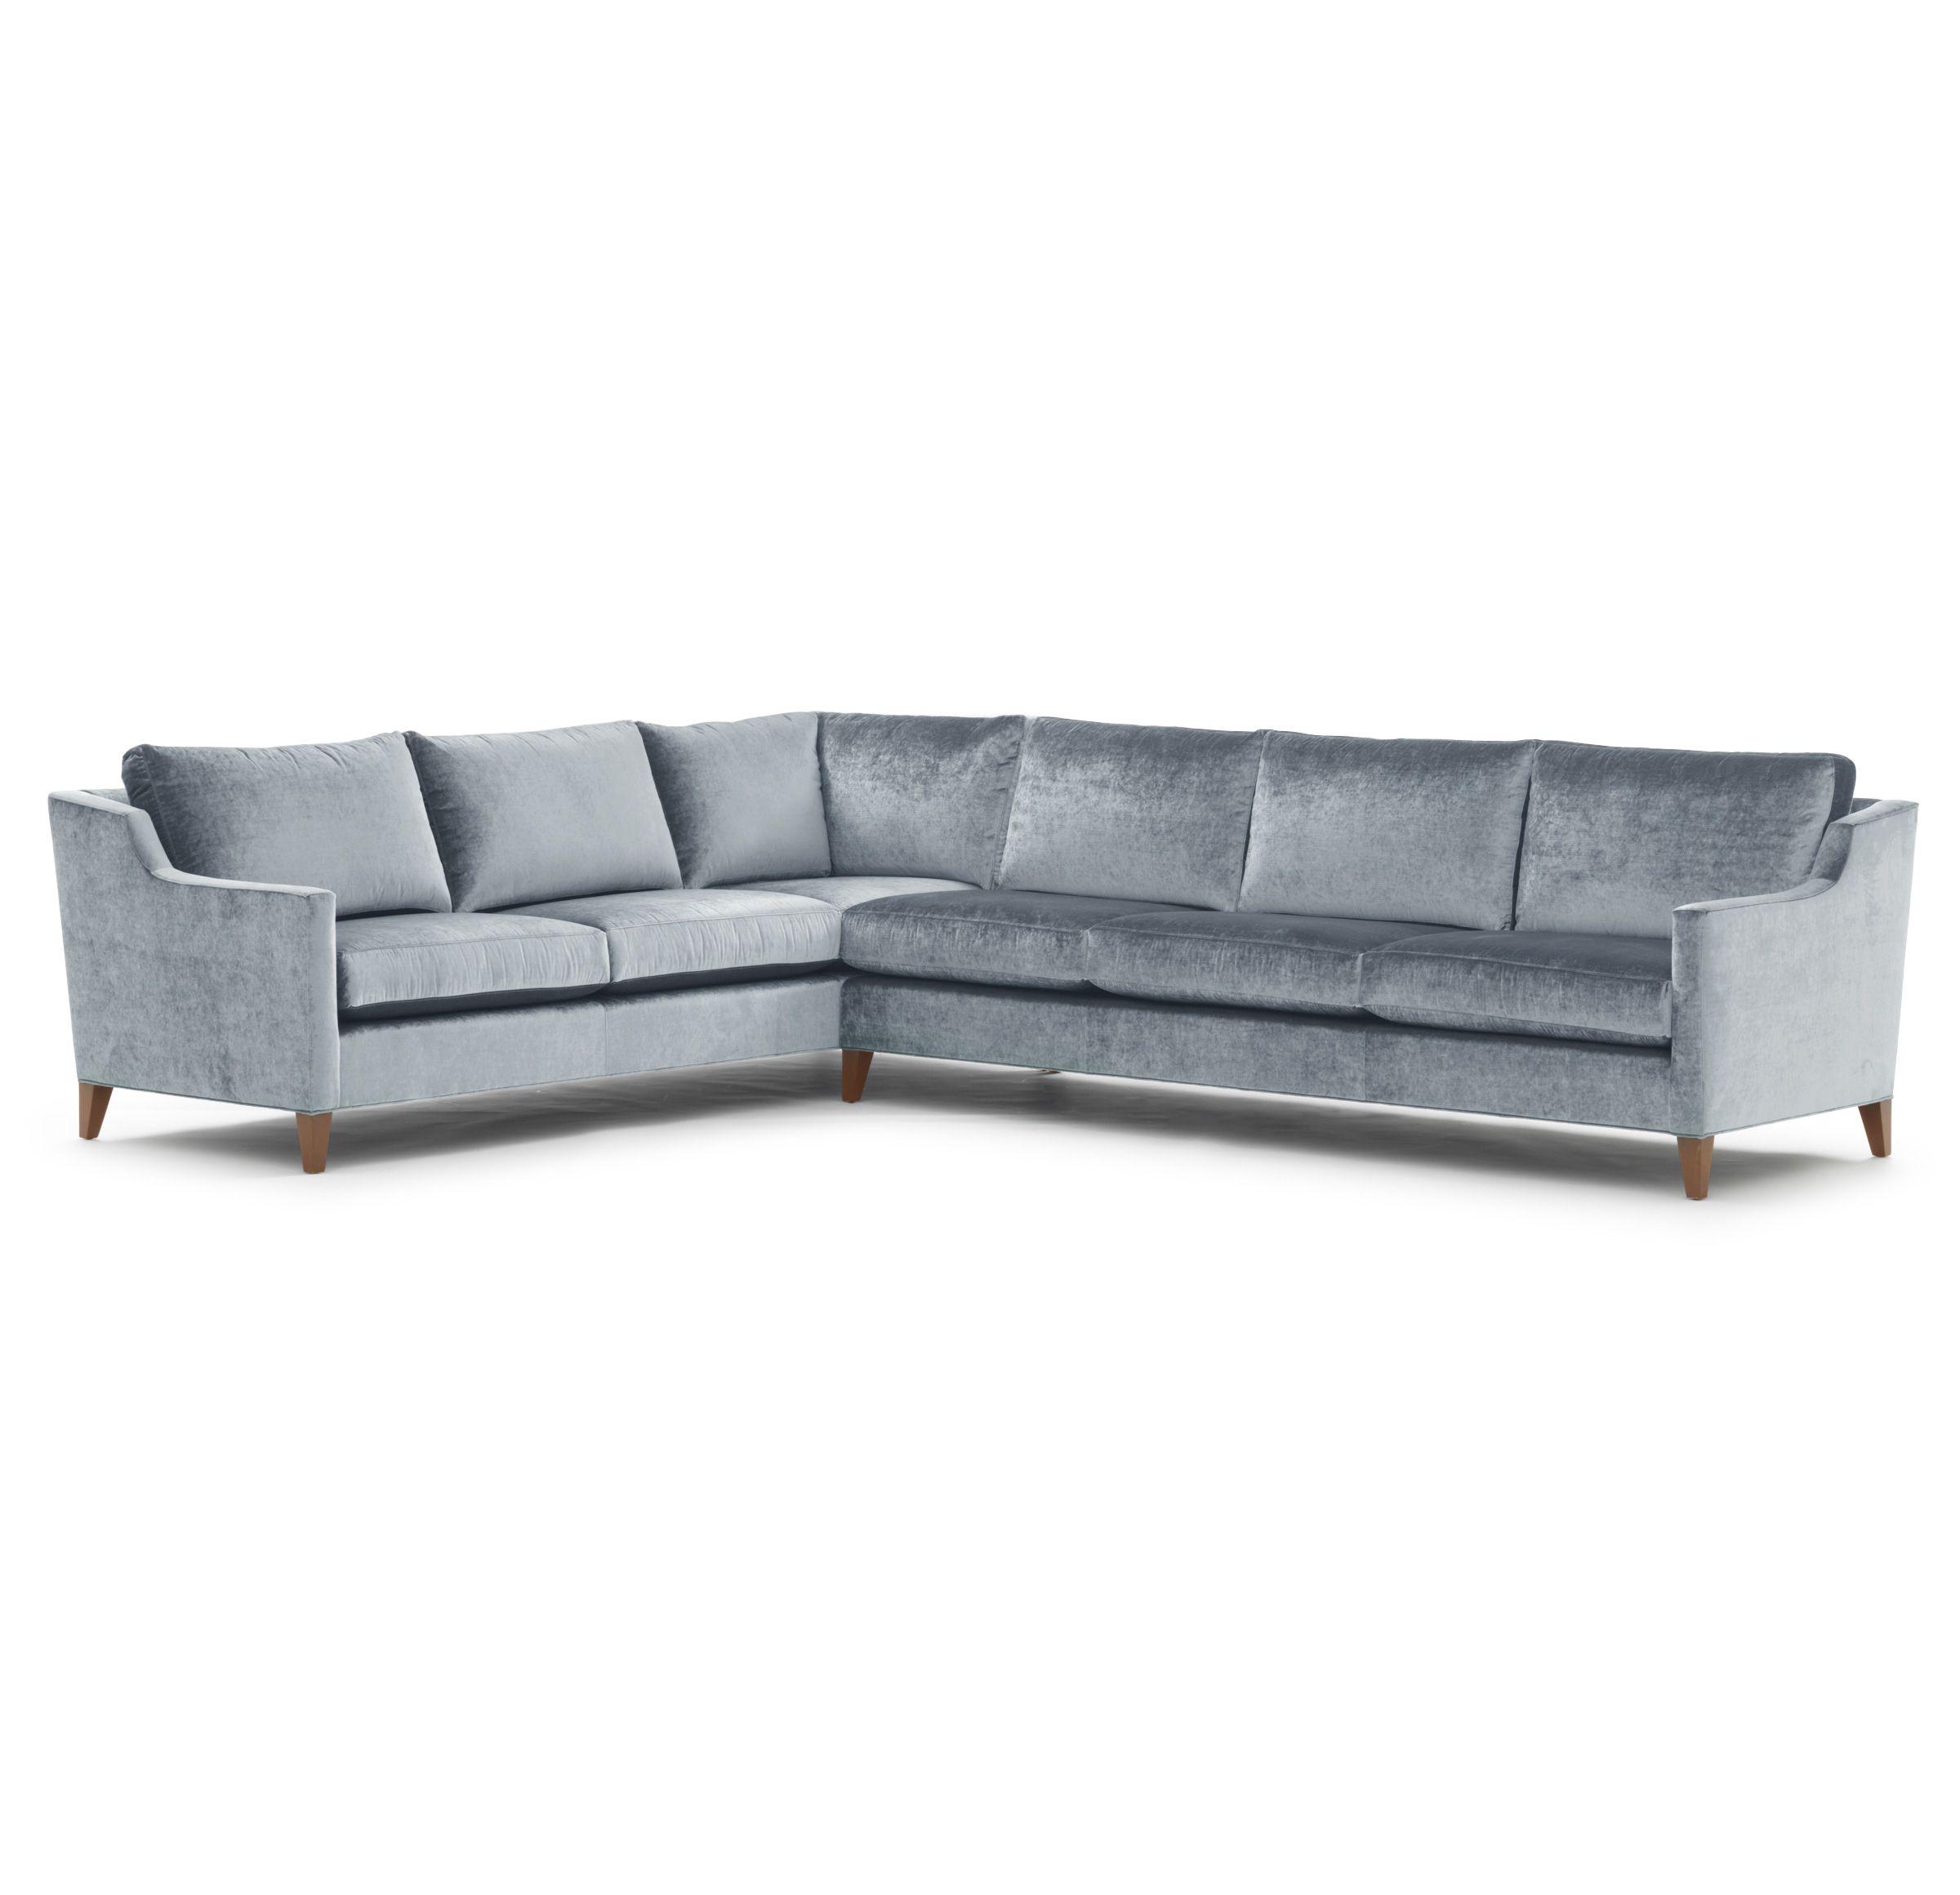 Gigi Left Sectional Sectional Sofa Sectional Sofa Layout Sofa